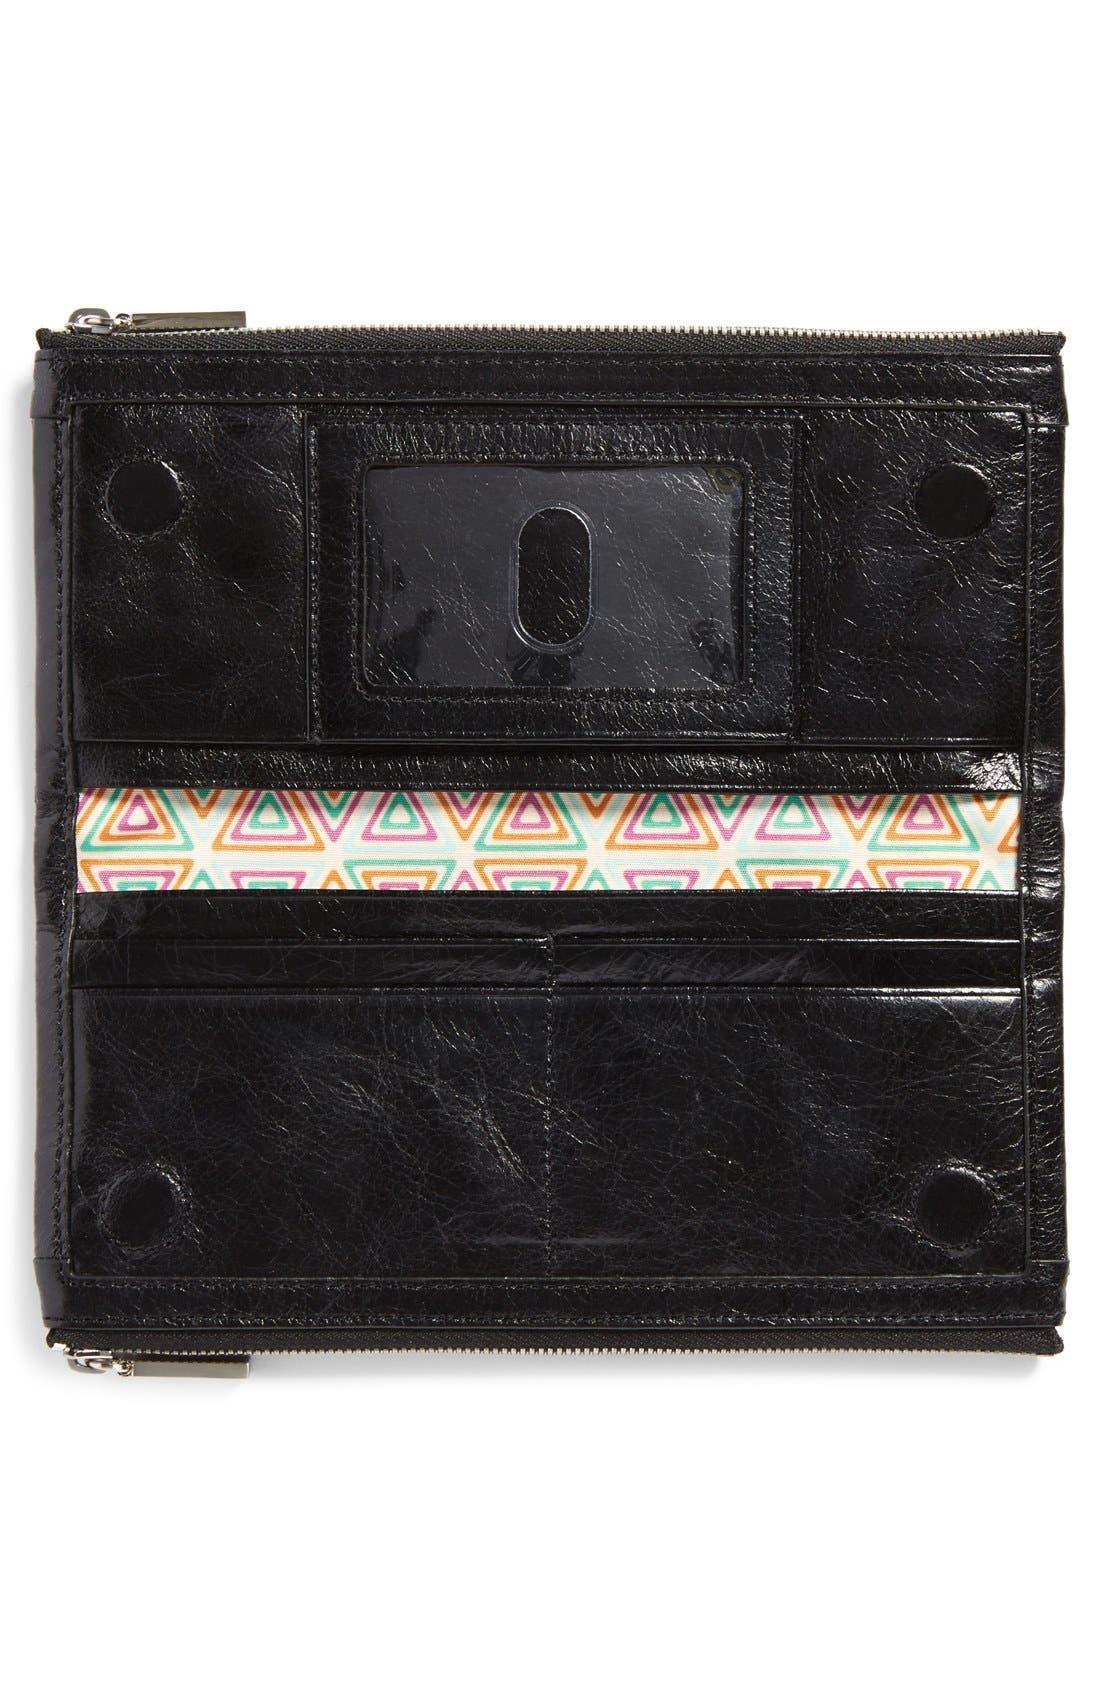 Taylor Glazed Wallet,                             Alternate thumbnail 10, color,                             001